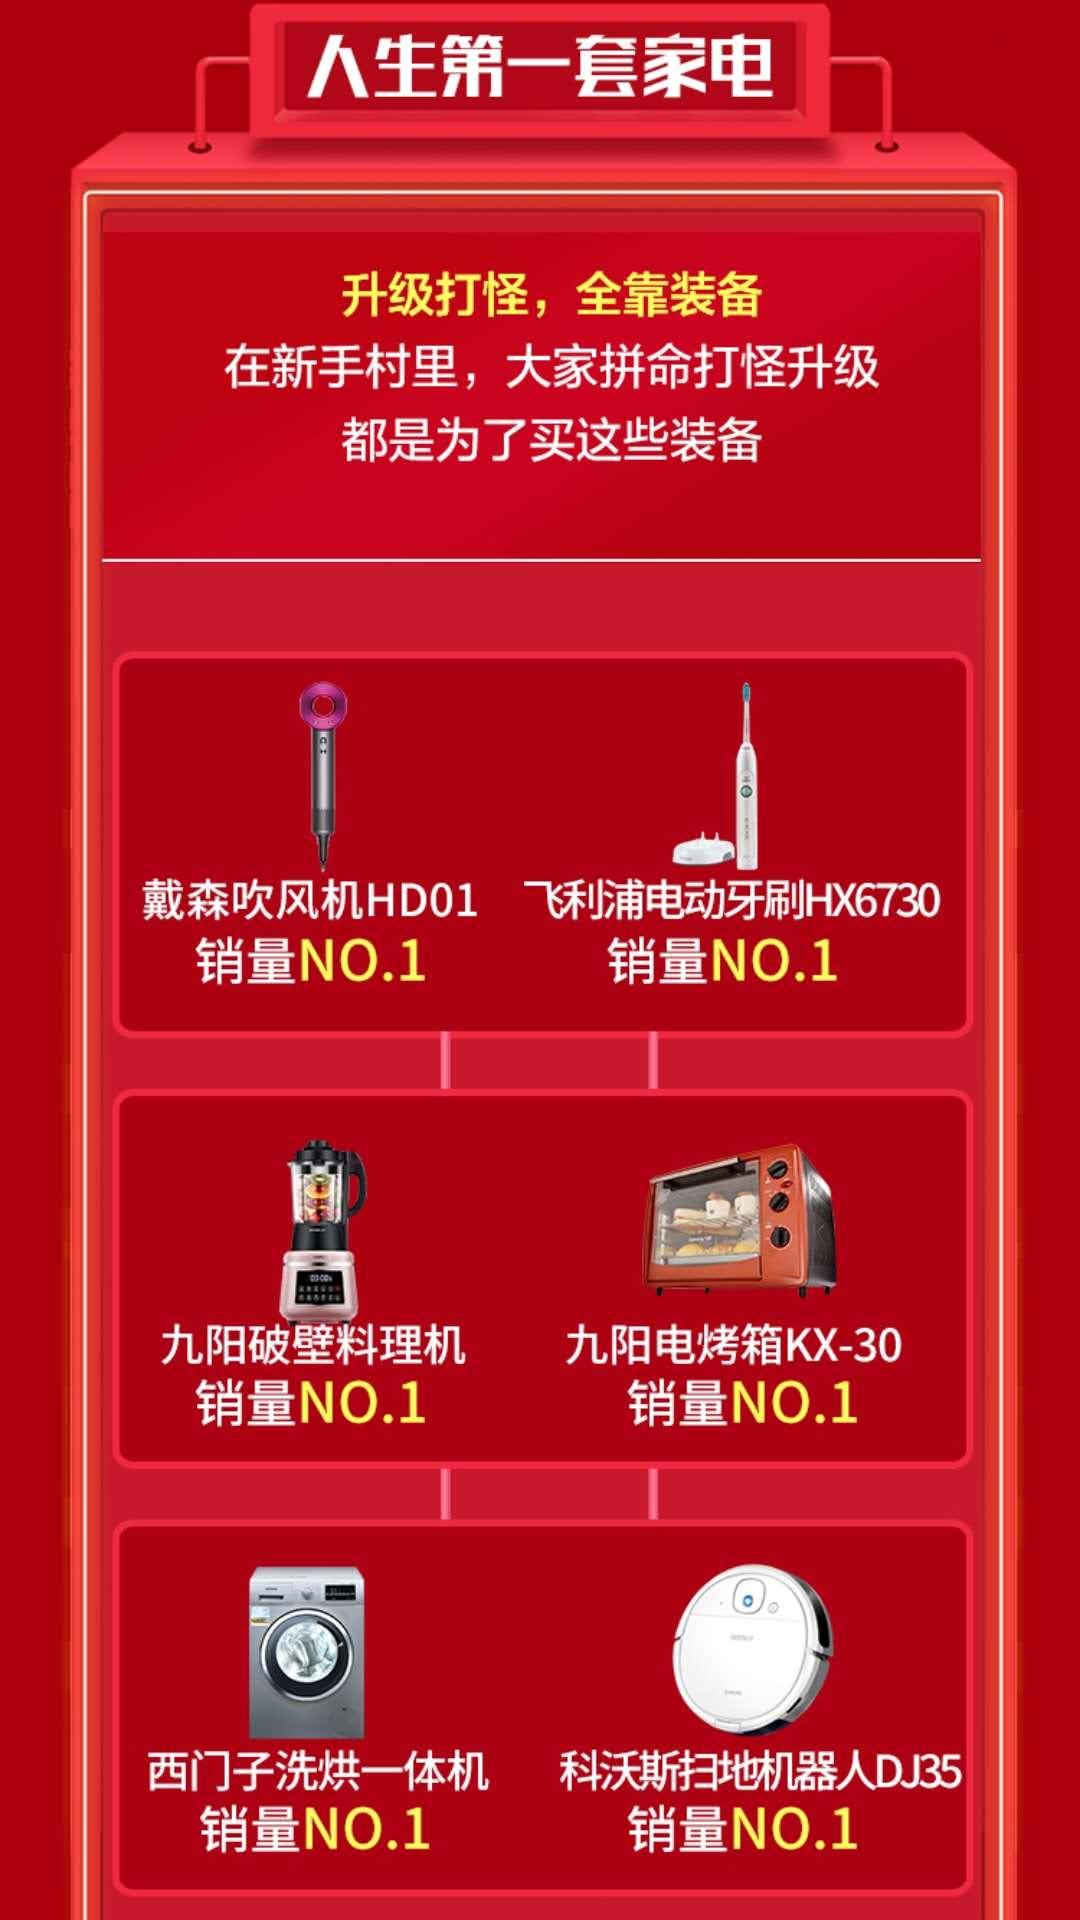 C:\Users\14051171\AppData\Local\Temp\WeChat Files\c402151bfa0509a8b12cd88238c60d5.jpg